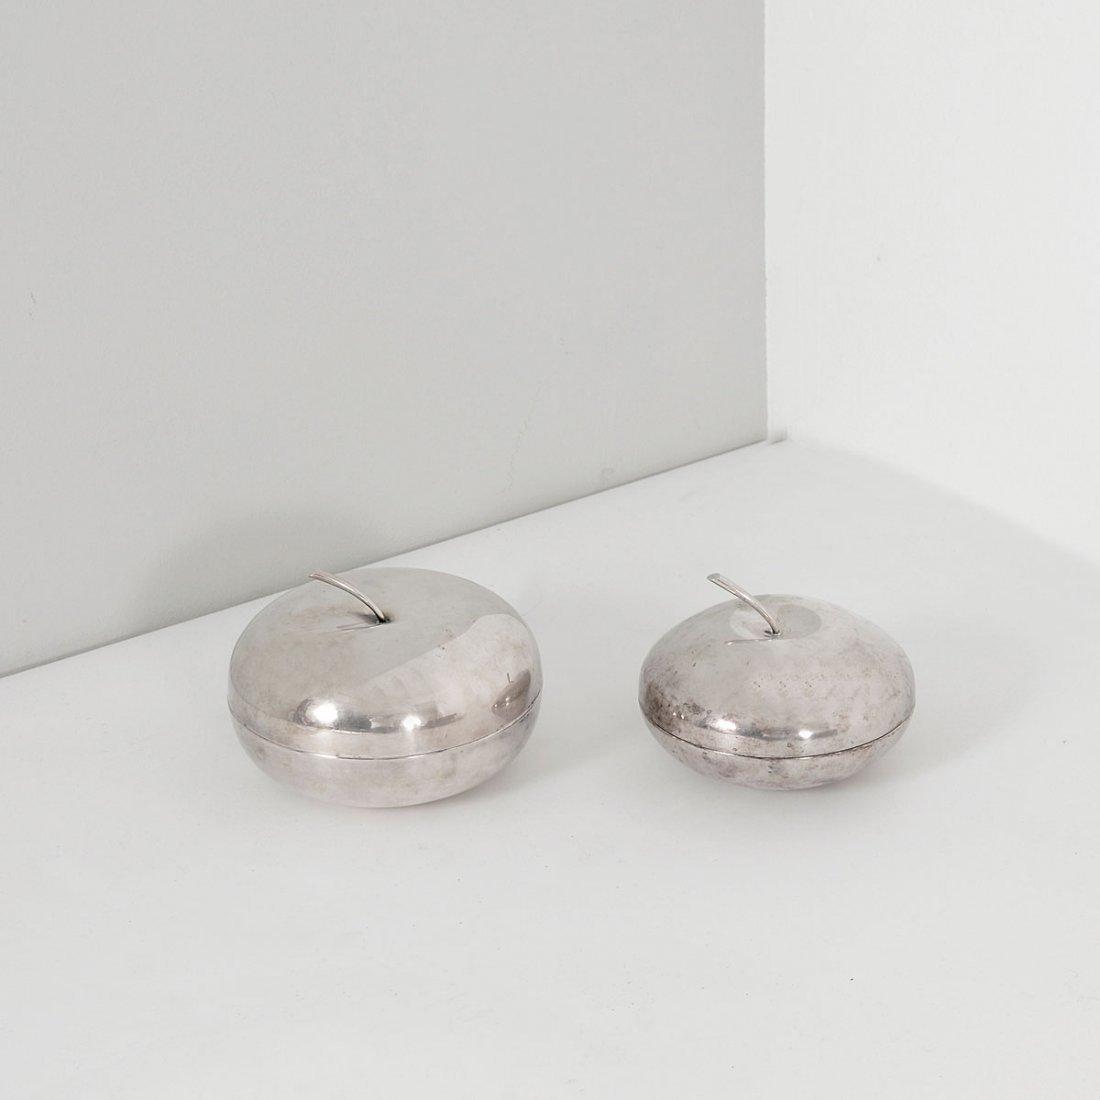 Pair of lidded bowls 'Apple', 1944